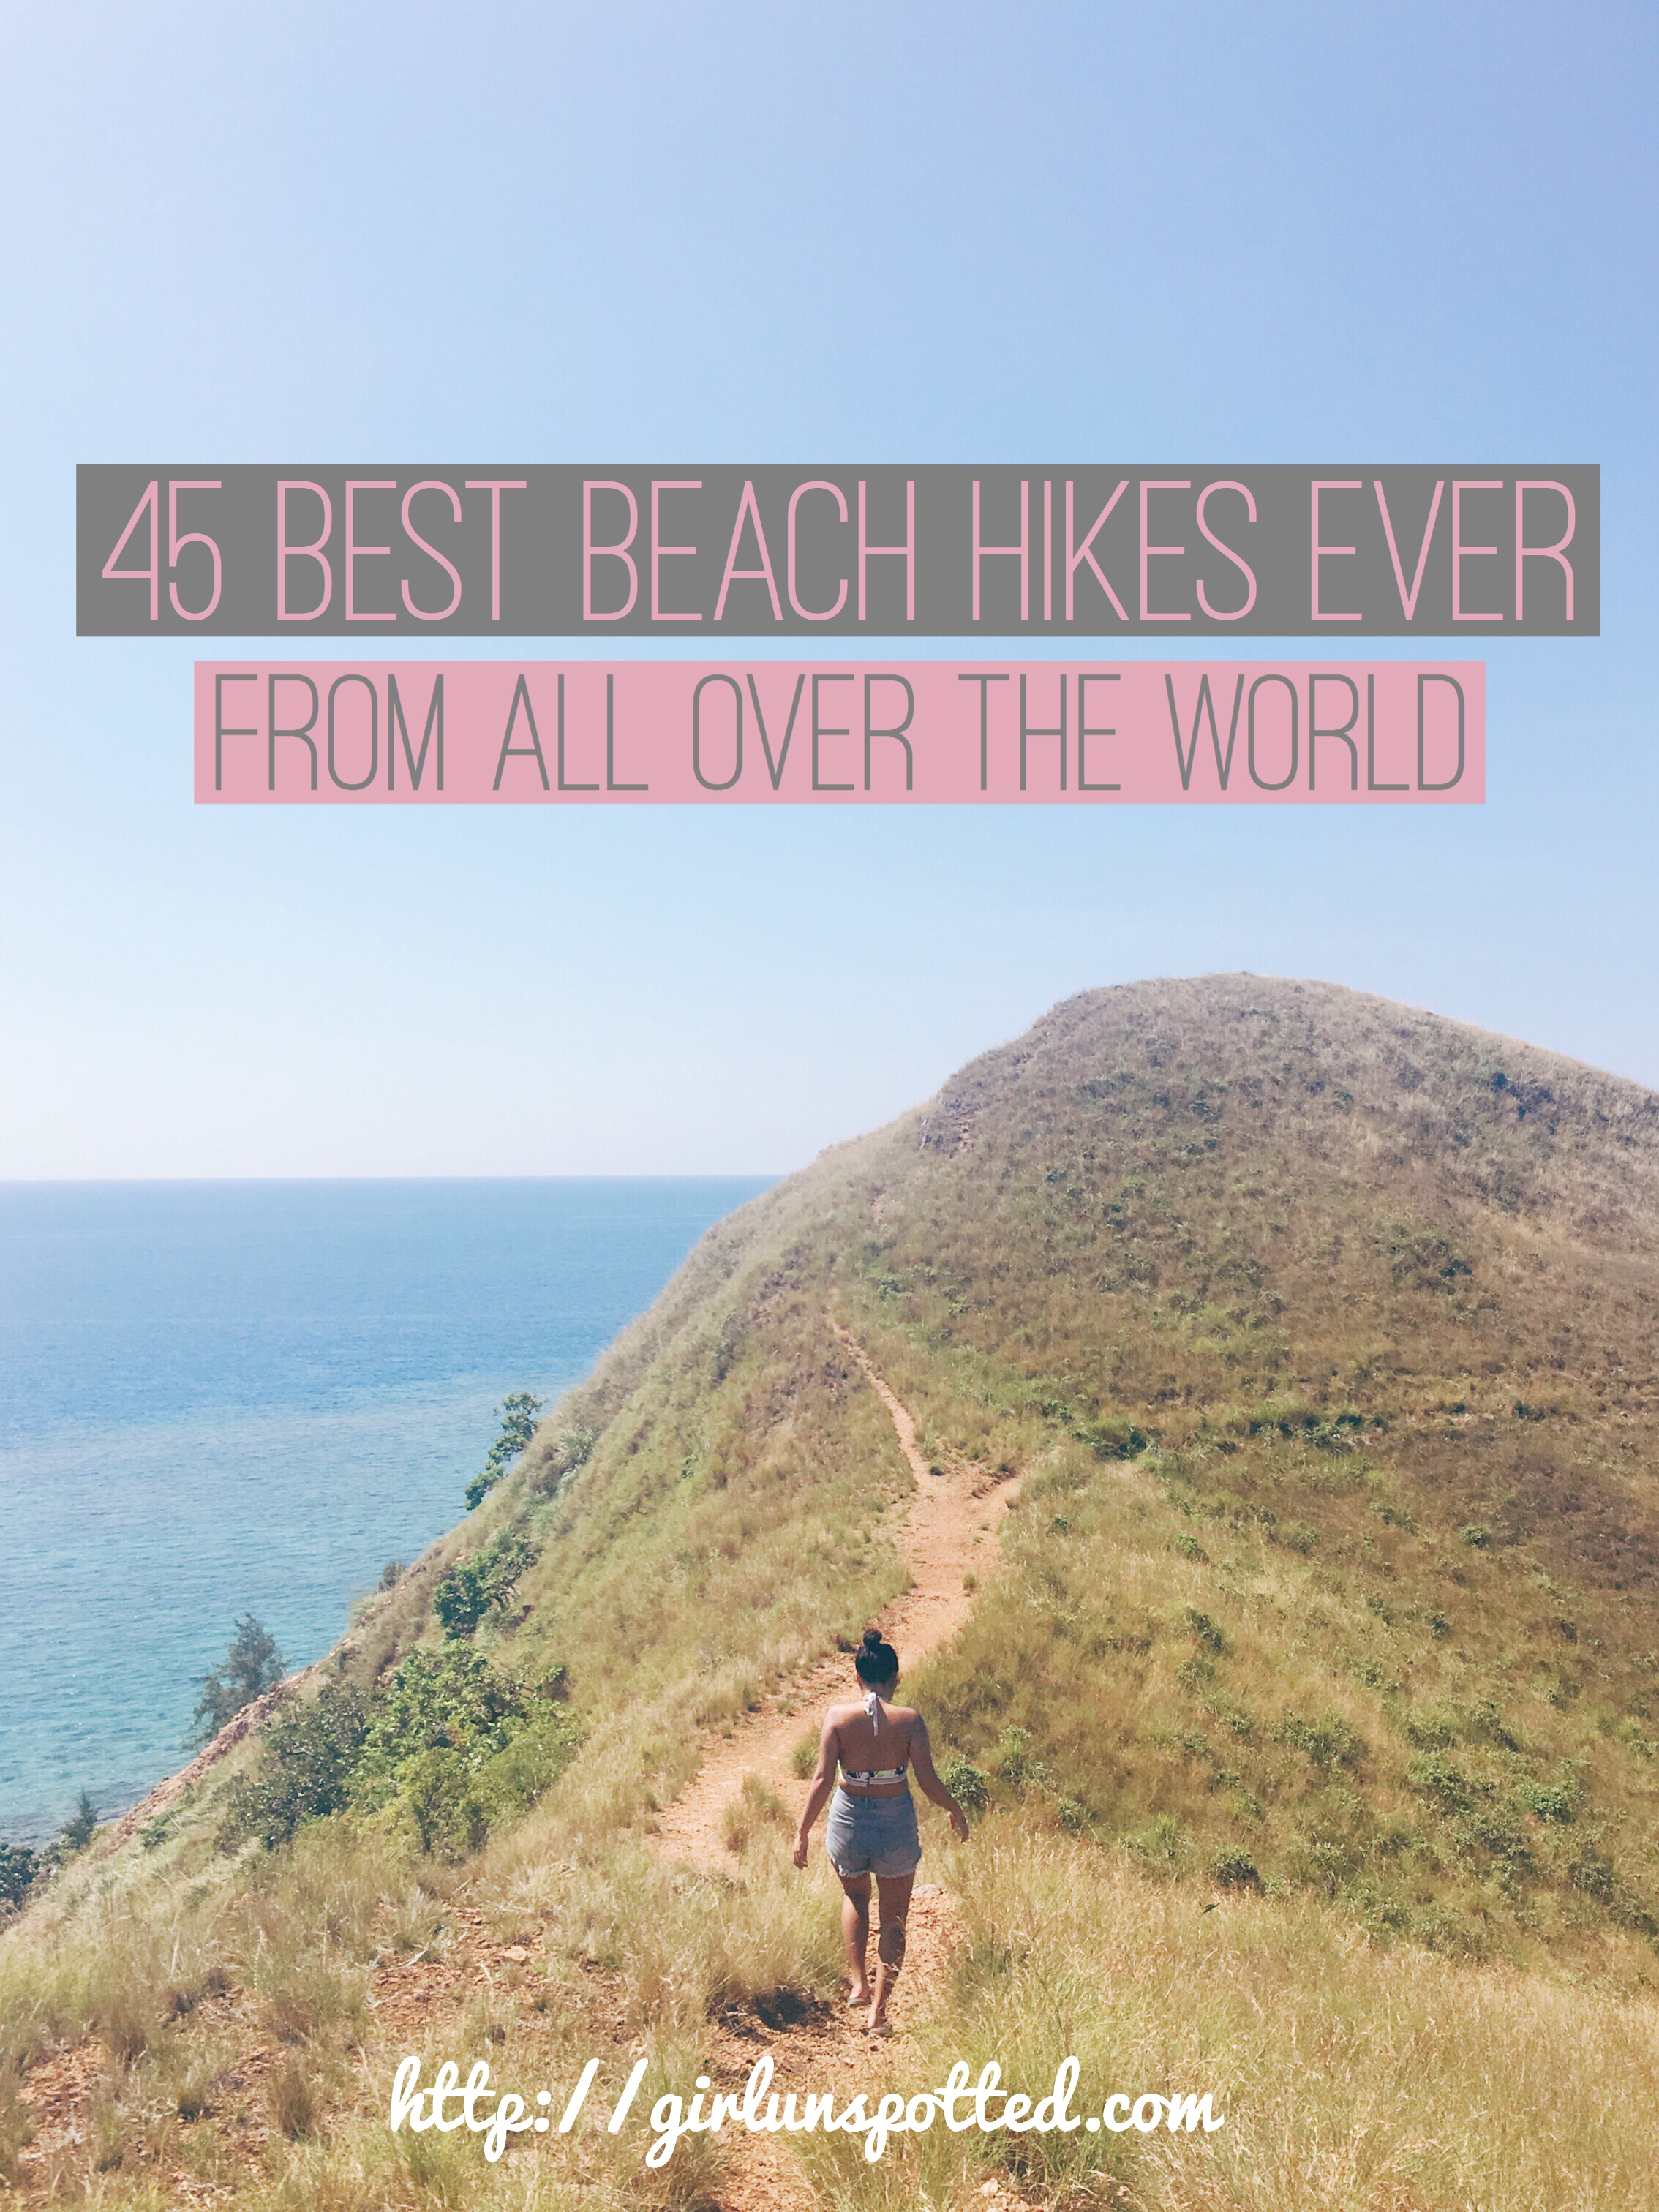 45 Best Beach Hikes Ever